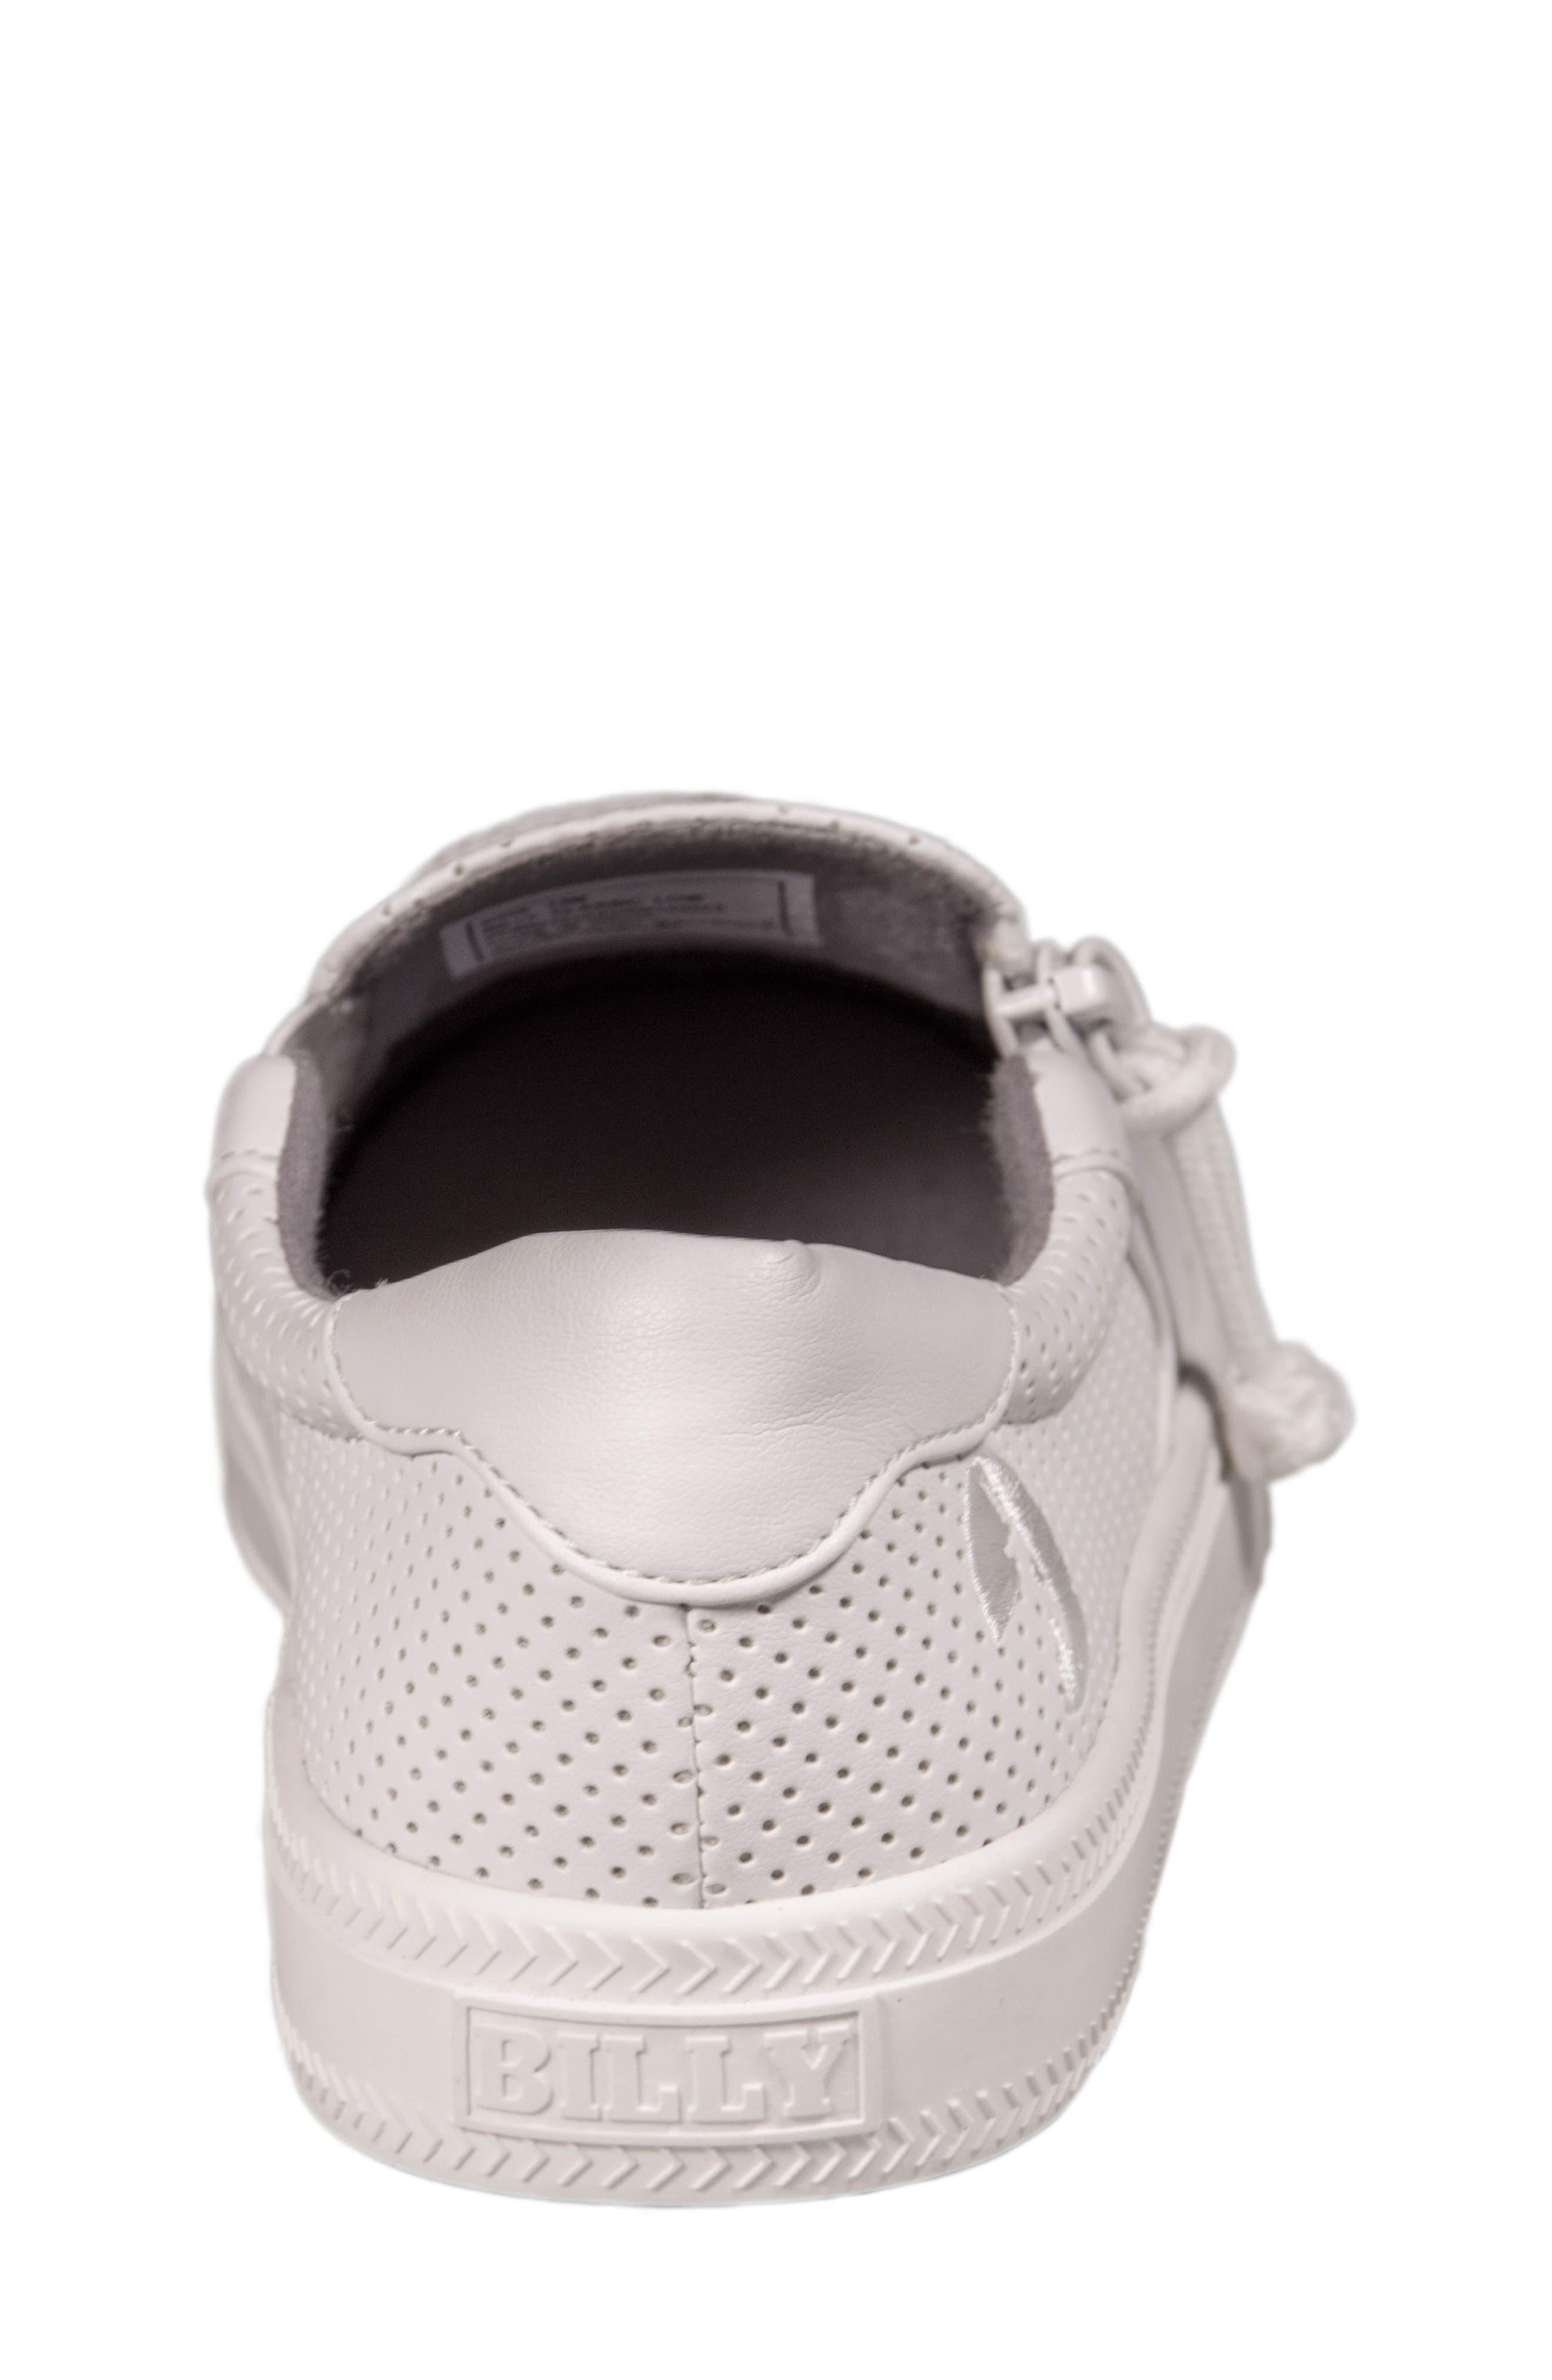 Zip Around Perforated Low Top Sneaker,                             Alternate thumbnail 14, color,